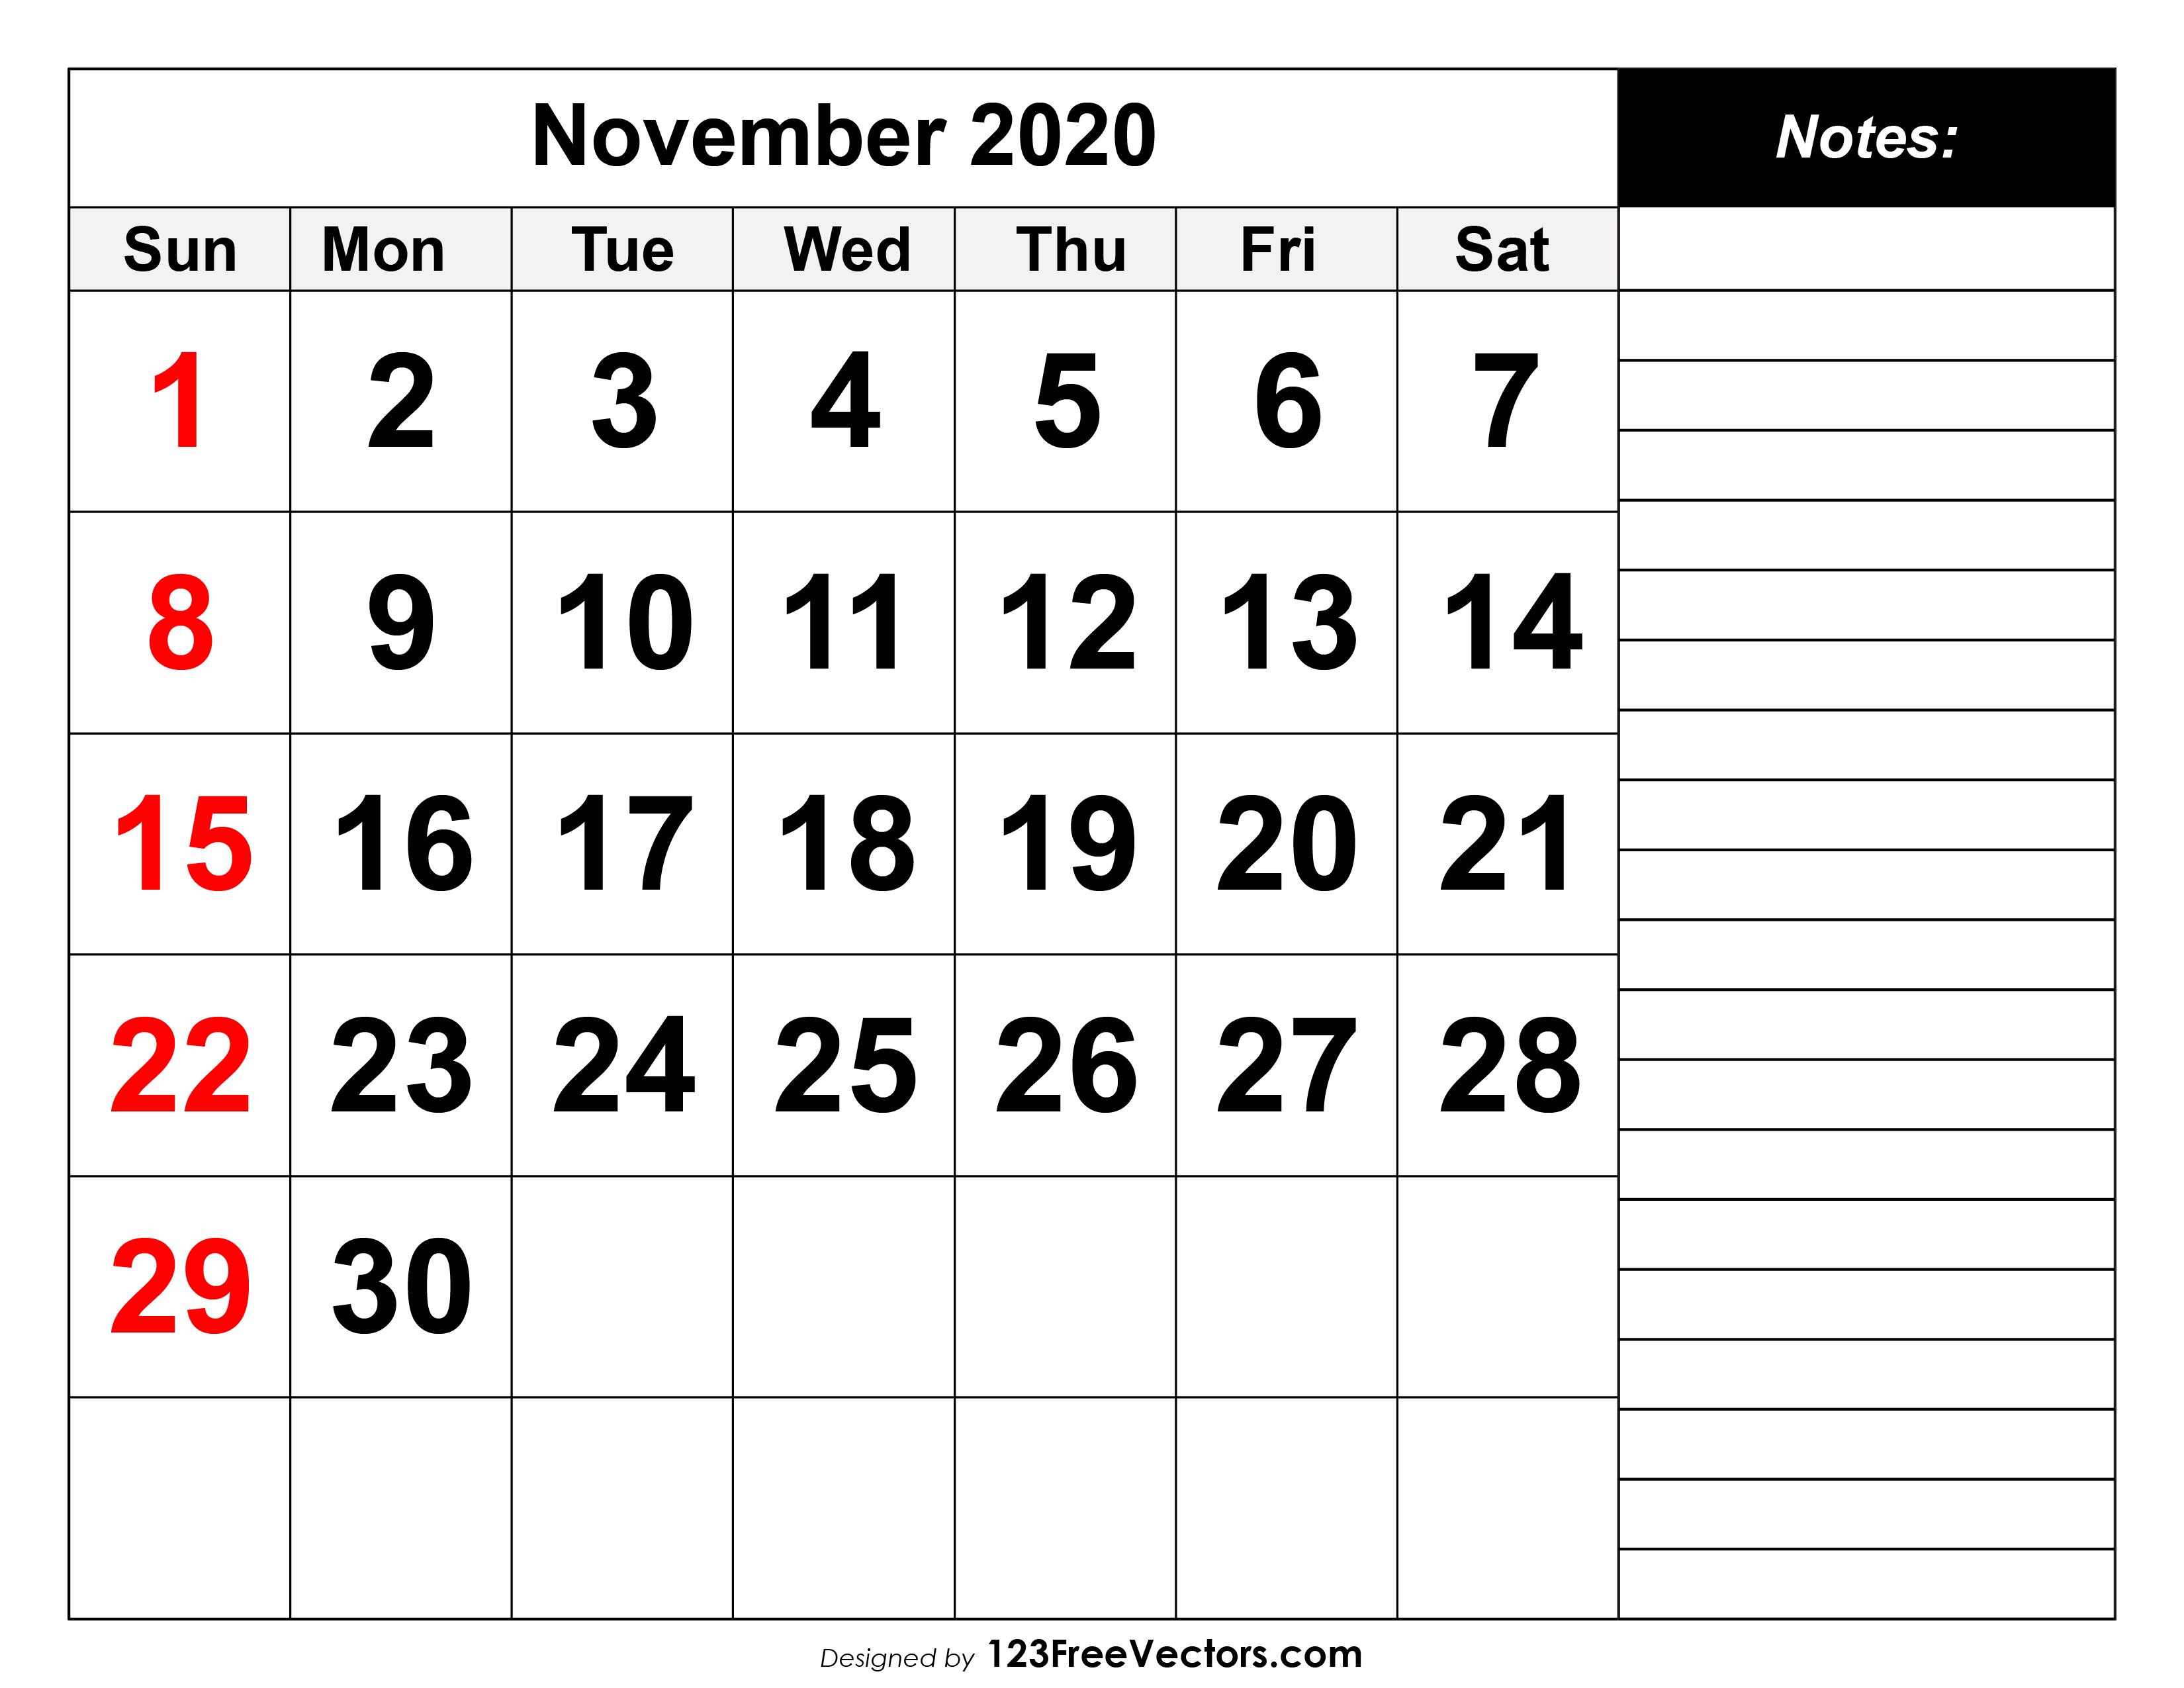 November Calendar 2020 Printable.November 2020 Printable Calendar